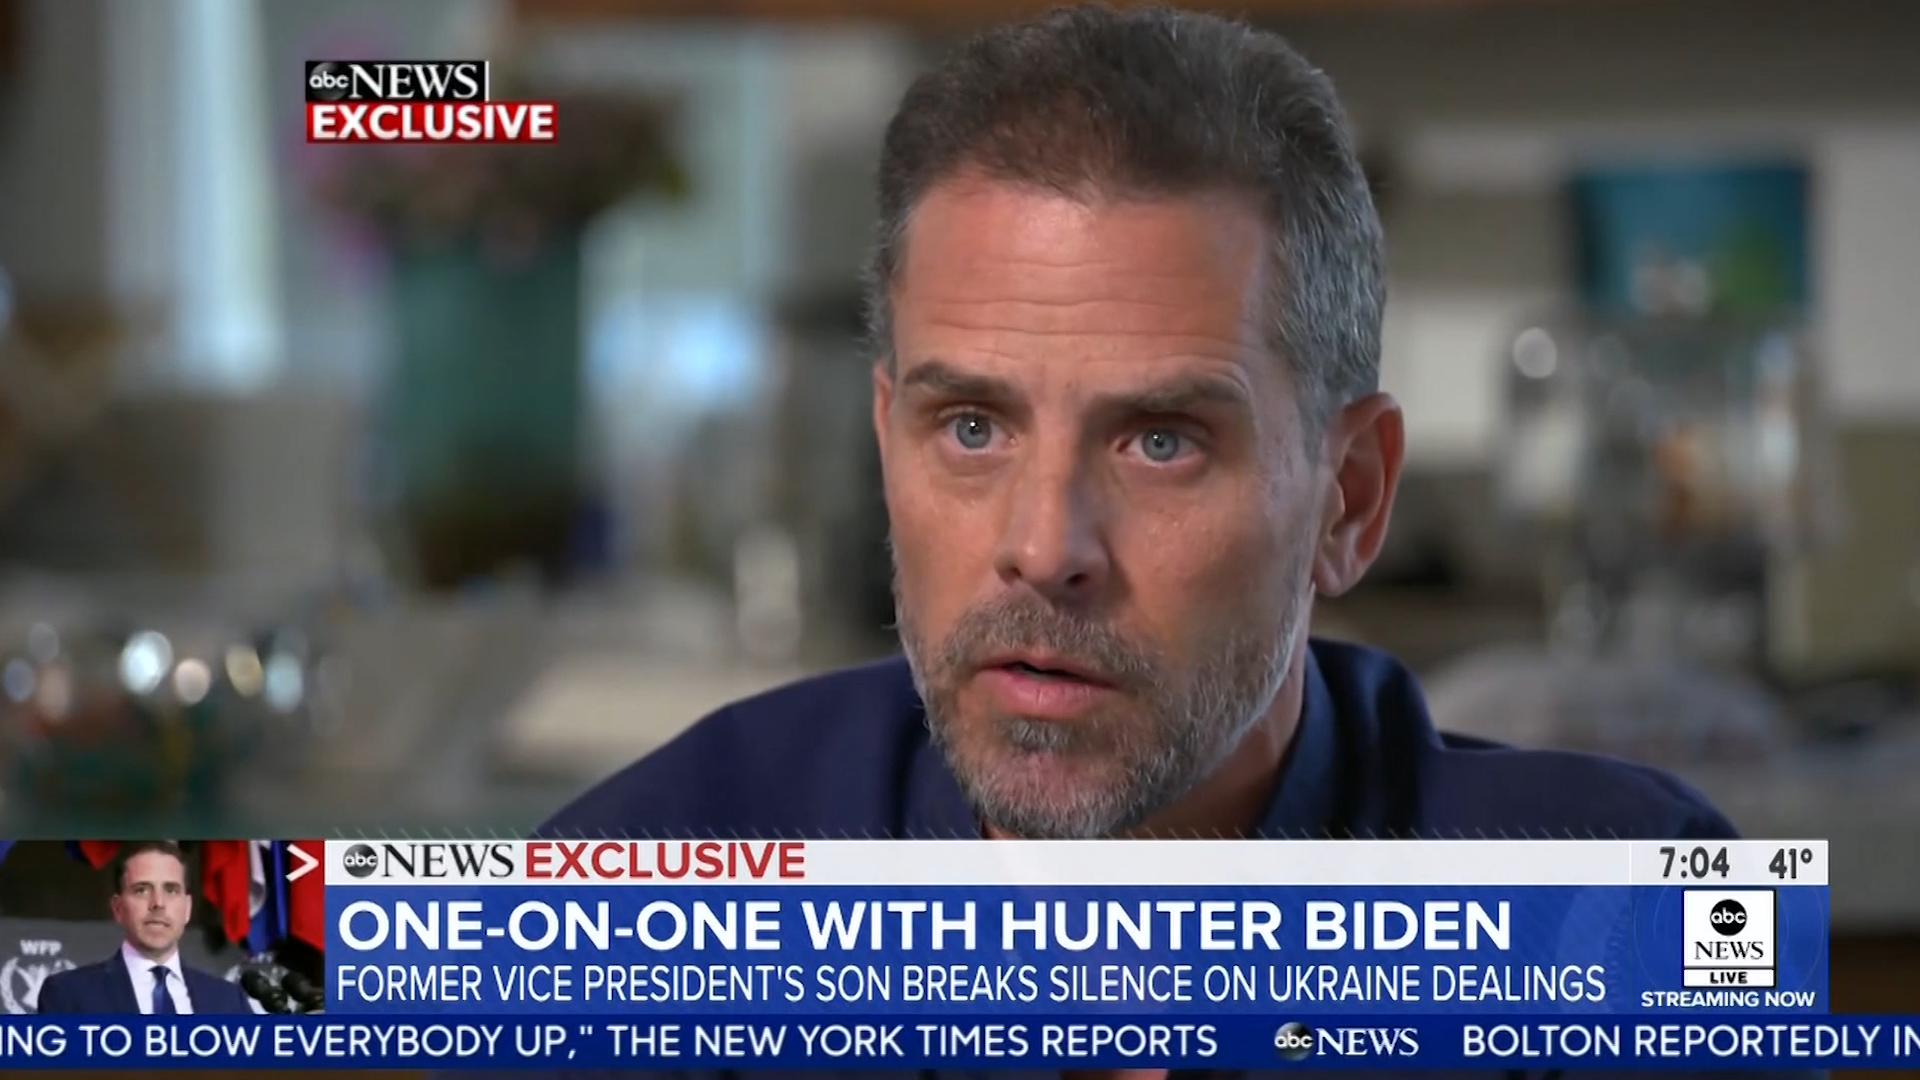 Diplomat tells investigators he raised alarms in 2015 about Hunter Biden's Ukraine work but was rebuffed